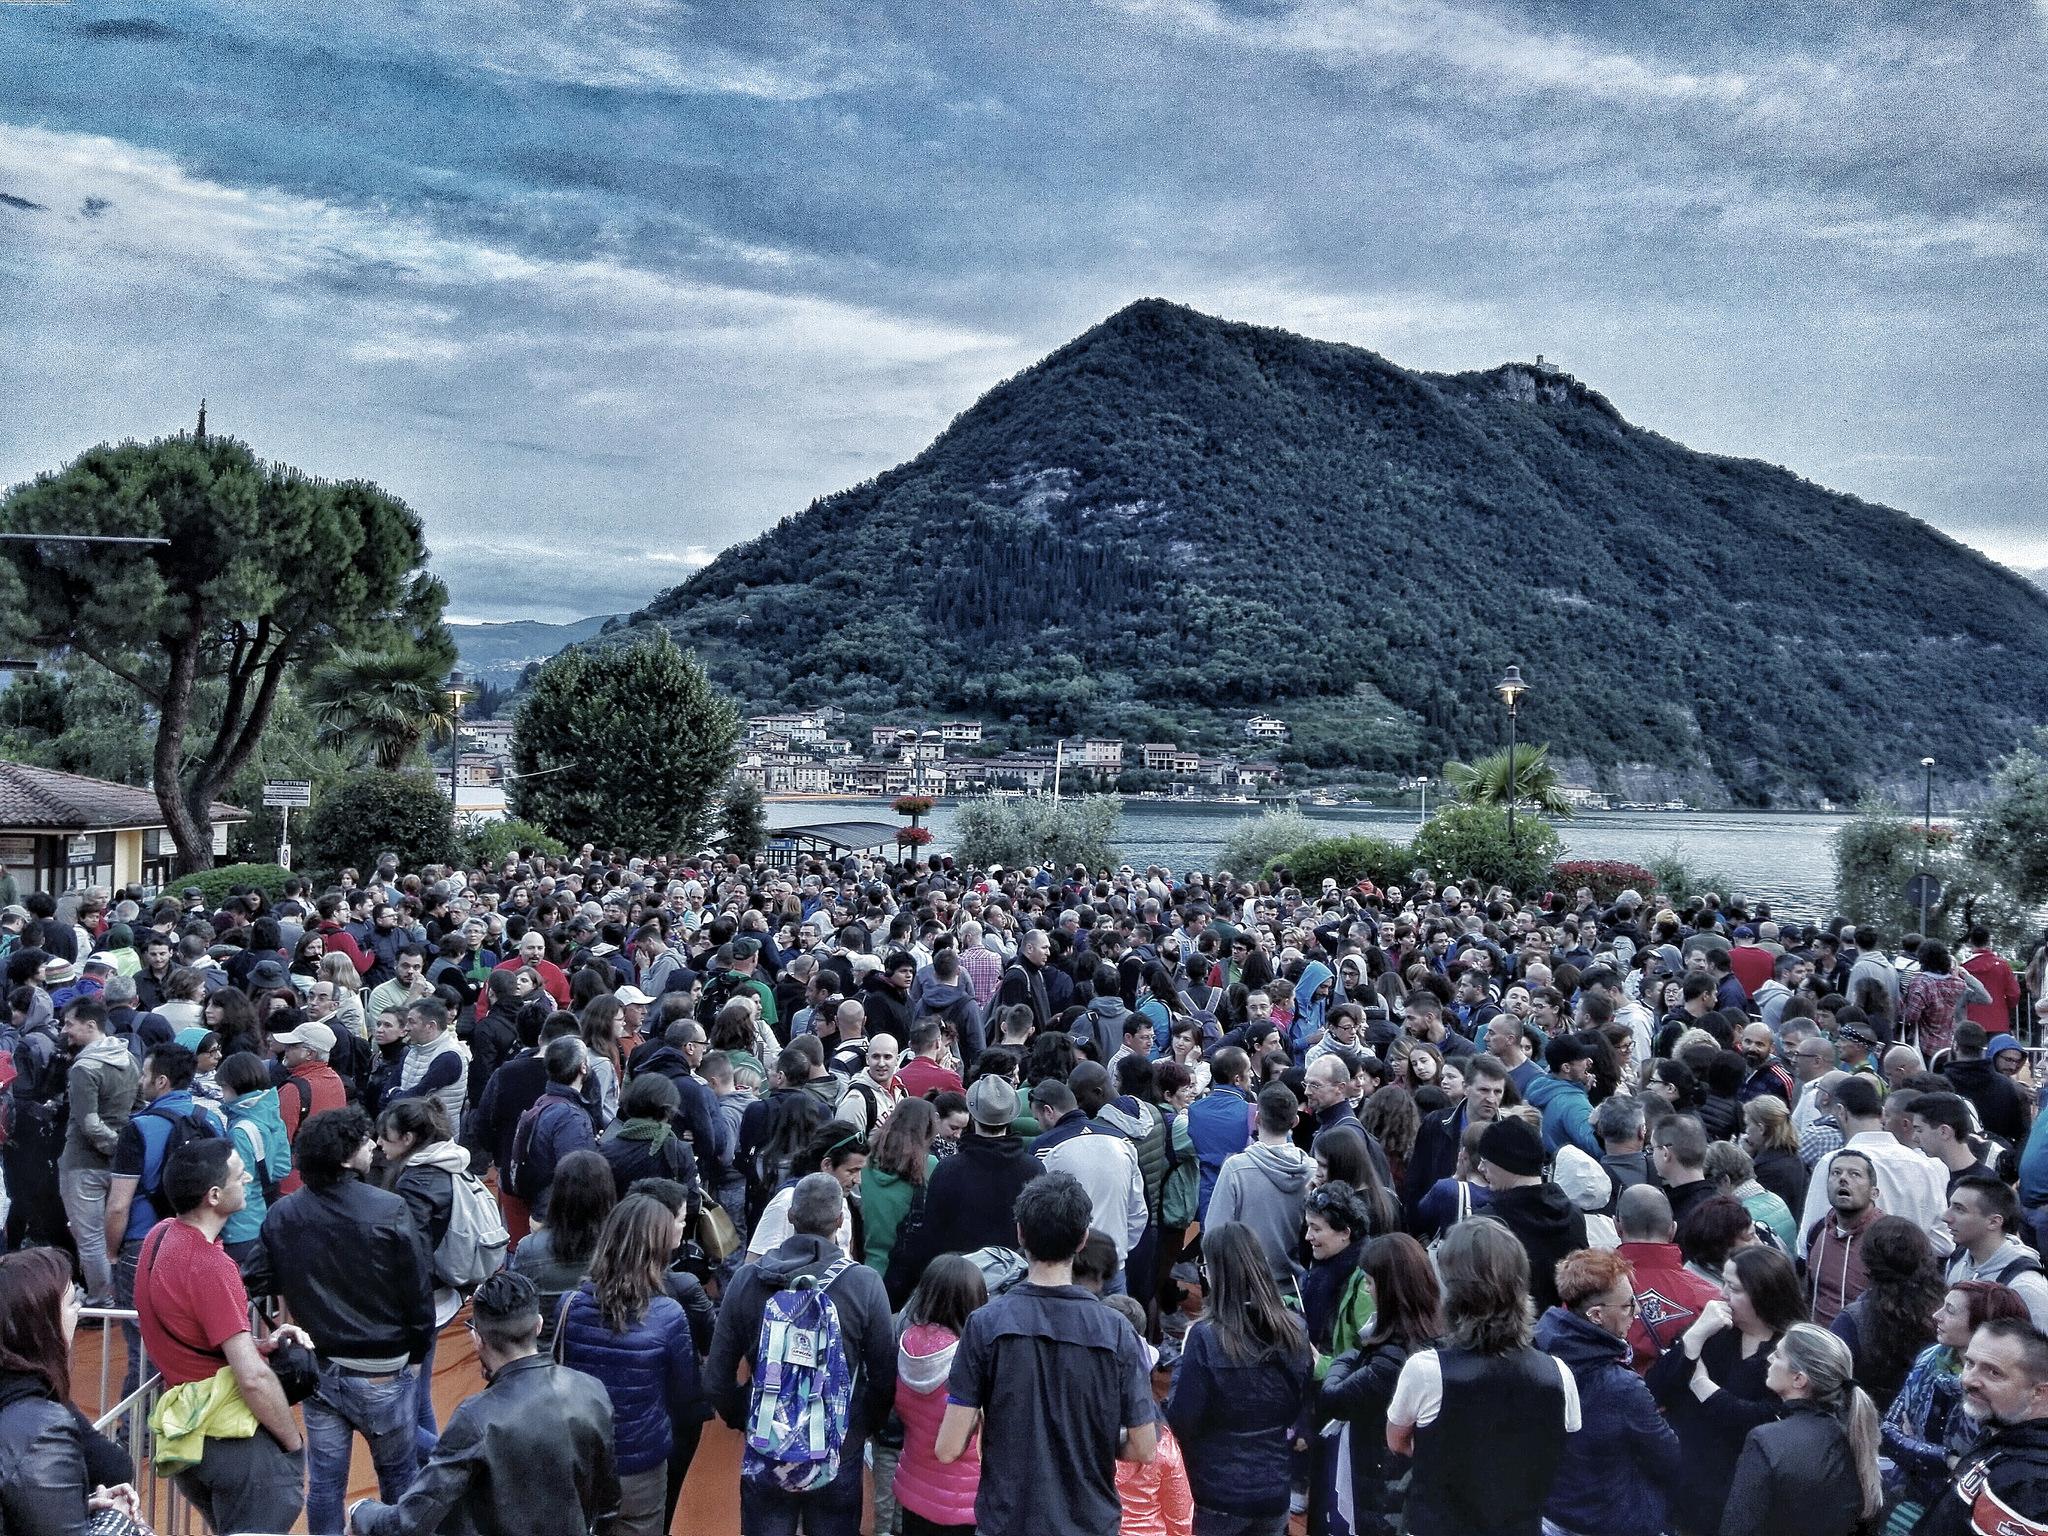 Floating Piers, l'emergenza Lago d'Iseo farà scuola. La testimonianza diretta di chi sta operando a terra | Emergency Live 2